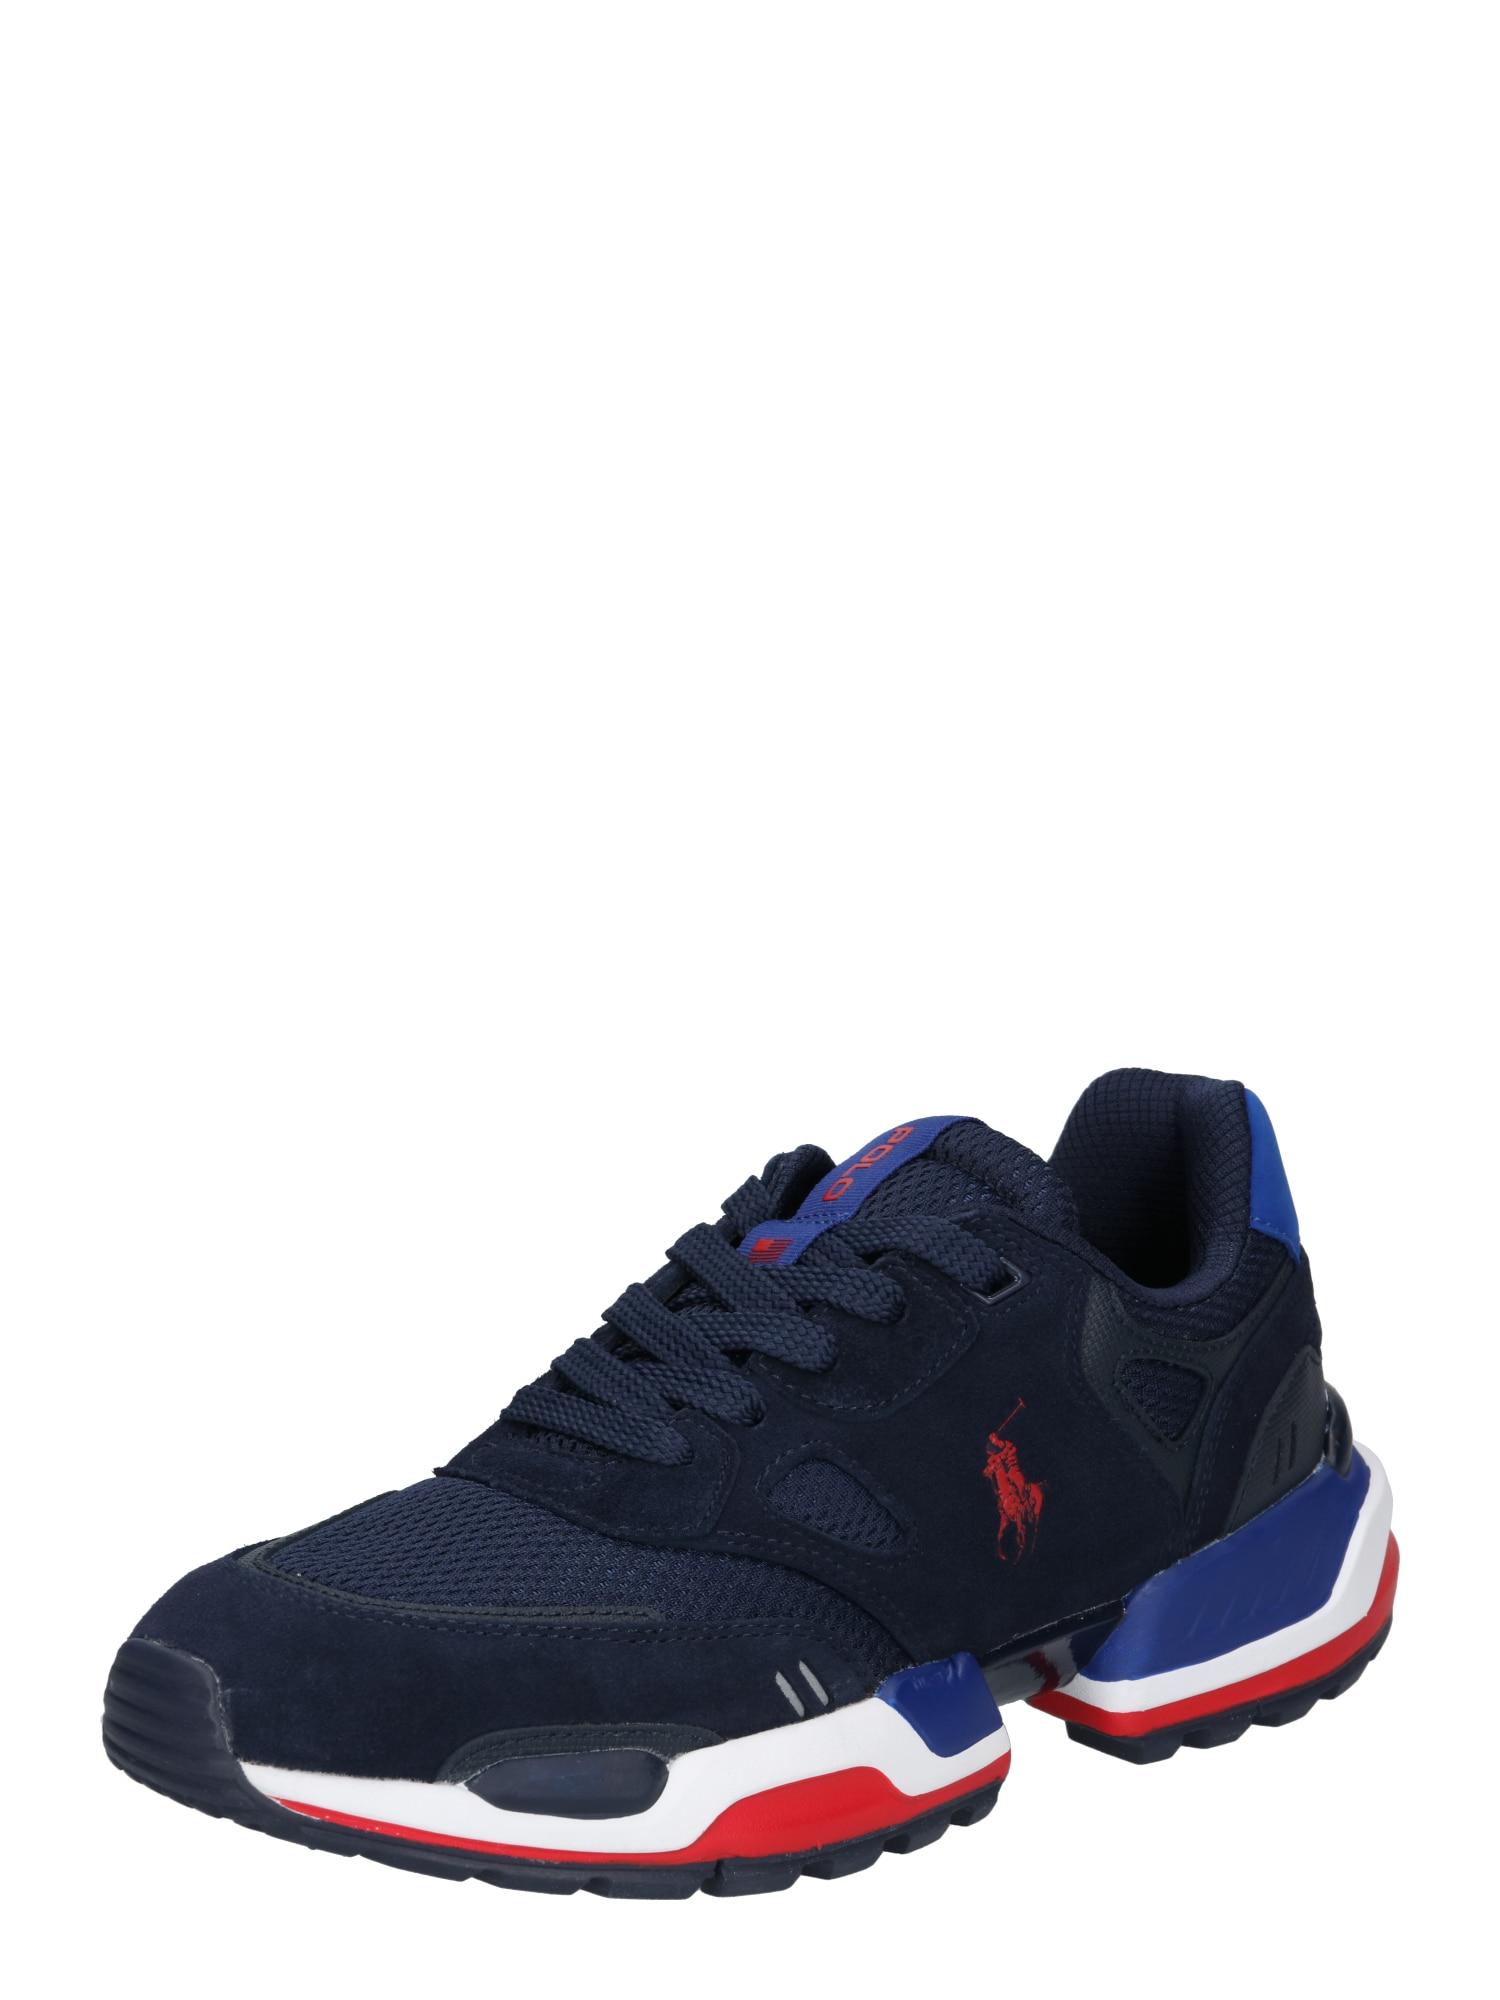 POLO RALPH LAUREN Tenisky  bílá / červená / tmavě modrá